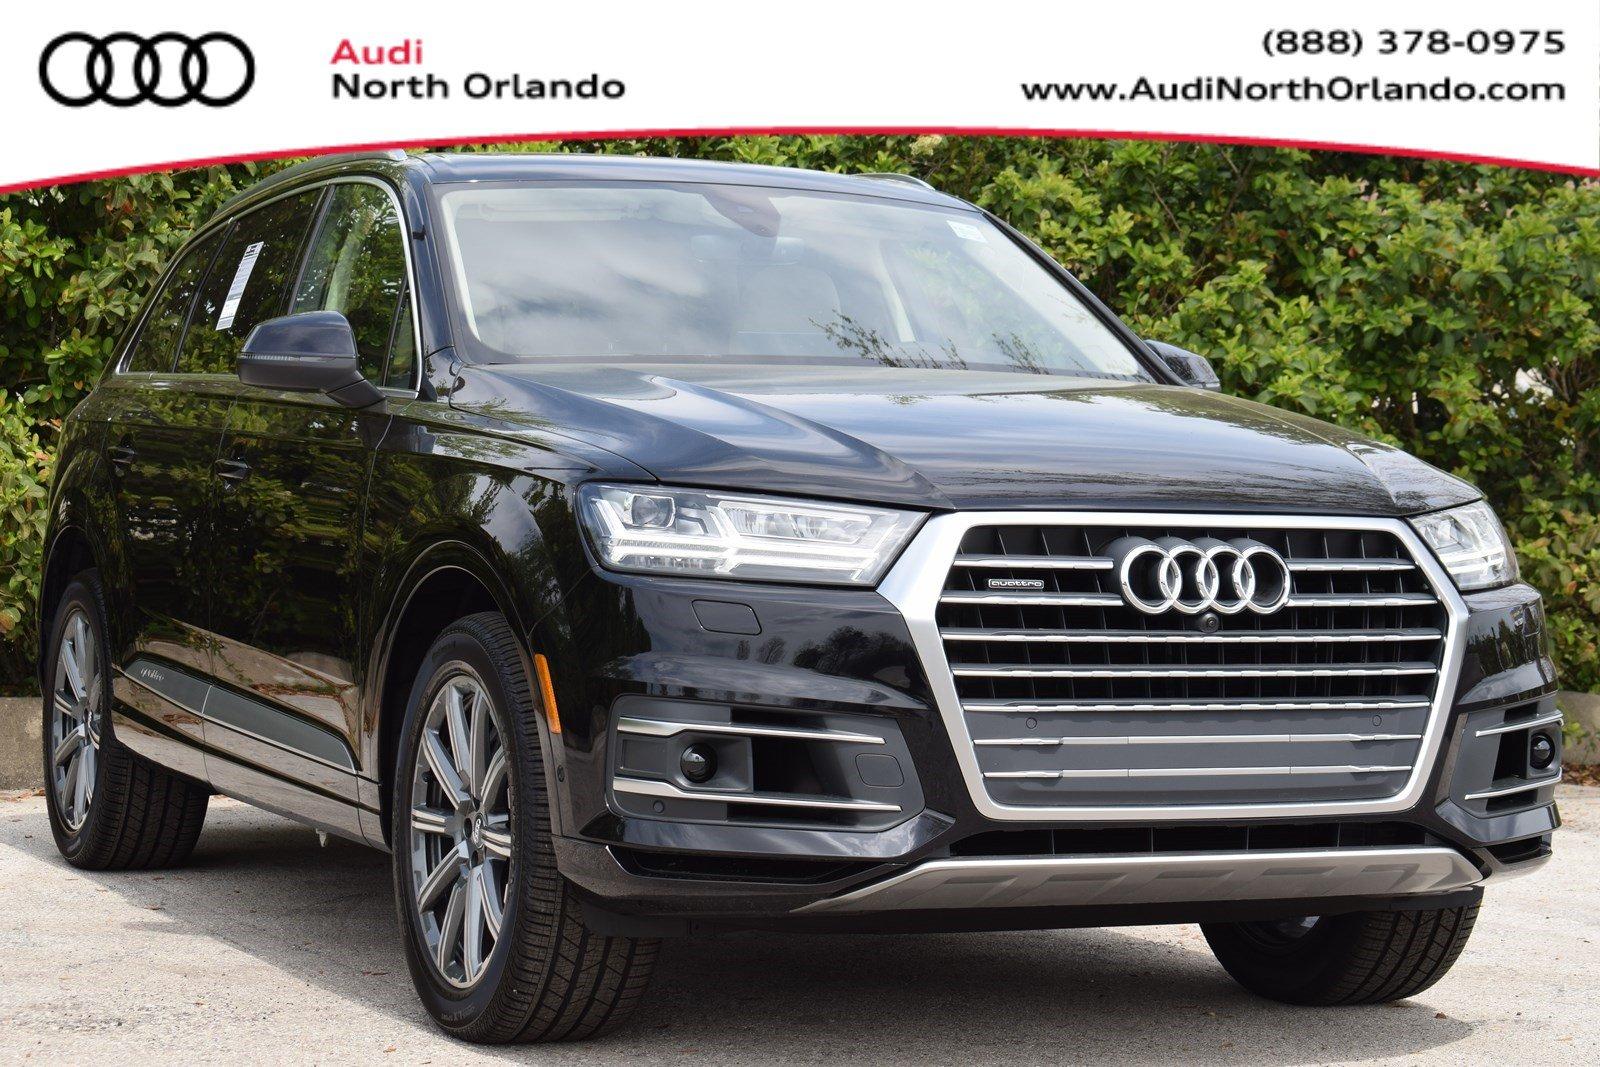 Featured new 2019 Audi Q7 3.0T Premium Plus SUV for sale in Sanford, FL, near Orlando, FL.